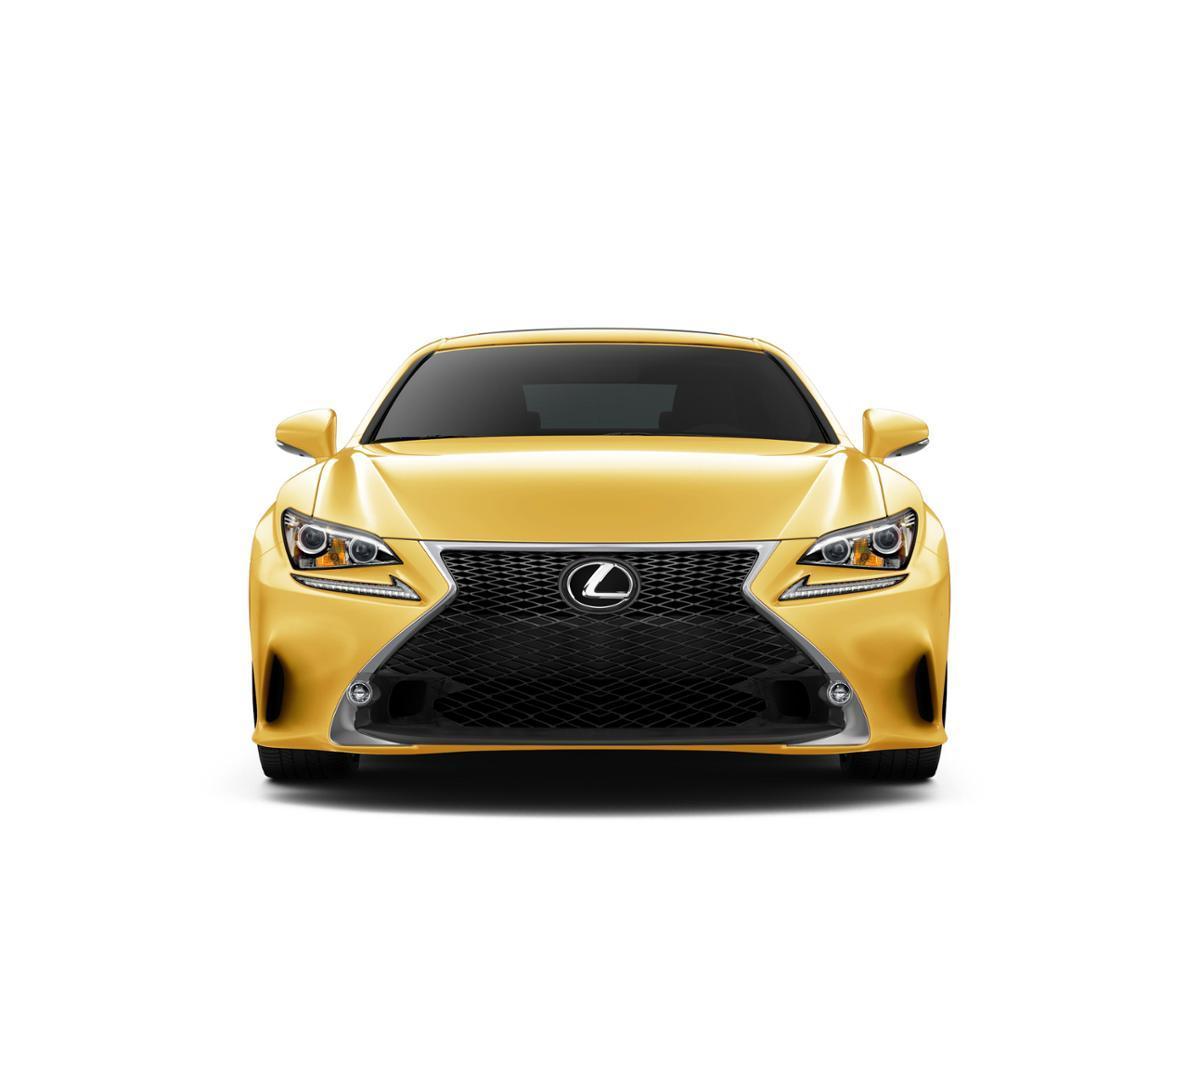 Lexus Gs Lease Deals: Toyota Lease Specials Los Angeles